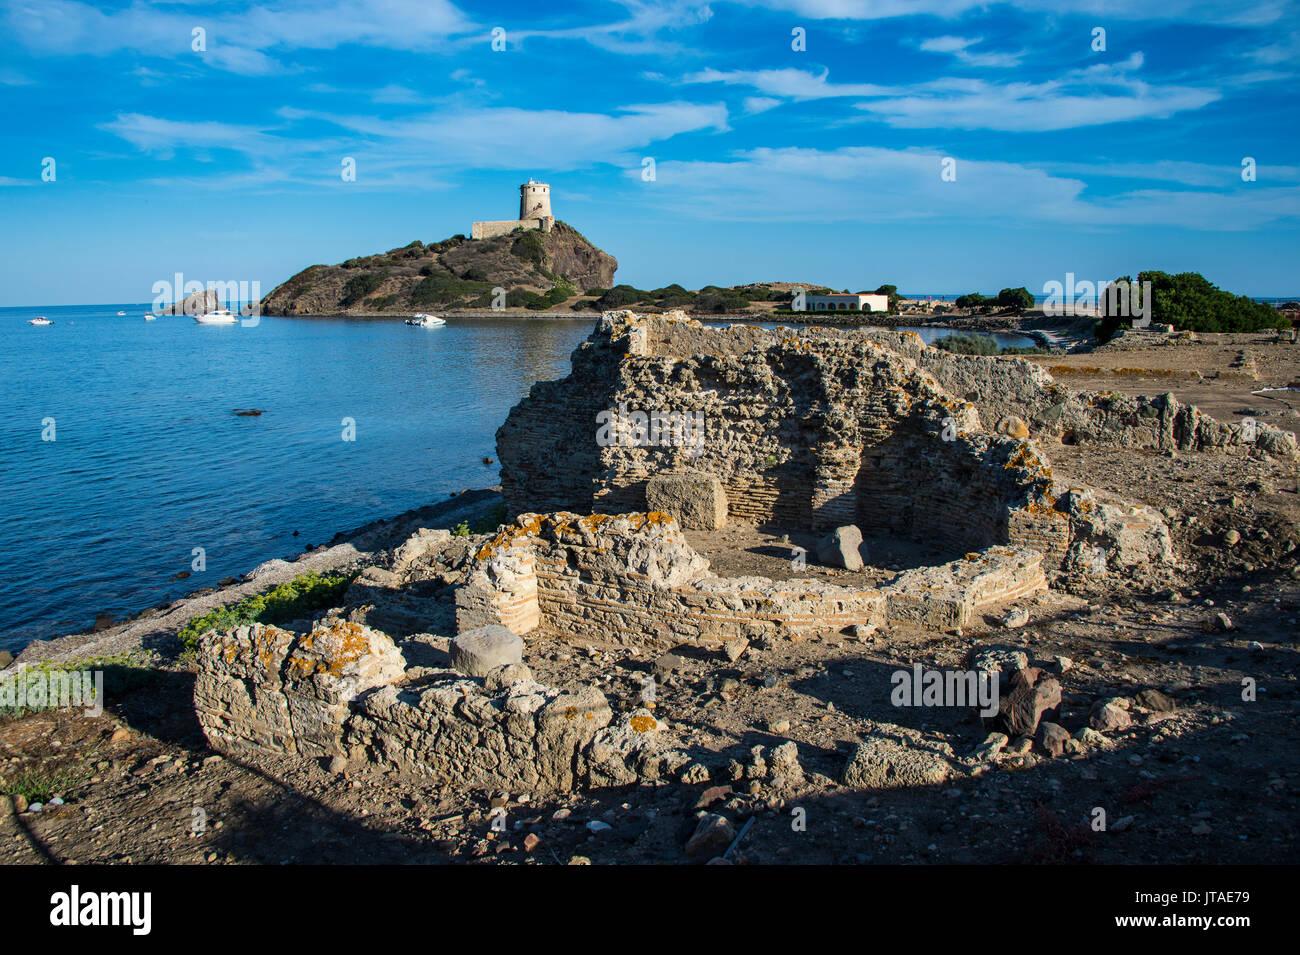 Nora archaeological site, Nora, Sardinia, Italy, Mediterranean, Europe - Stock Image